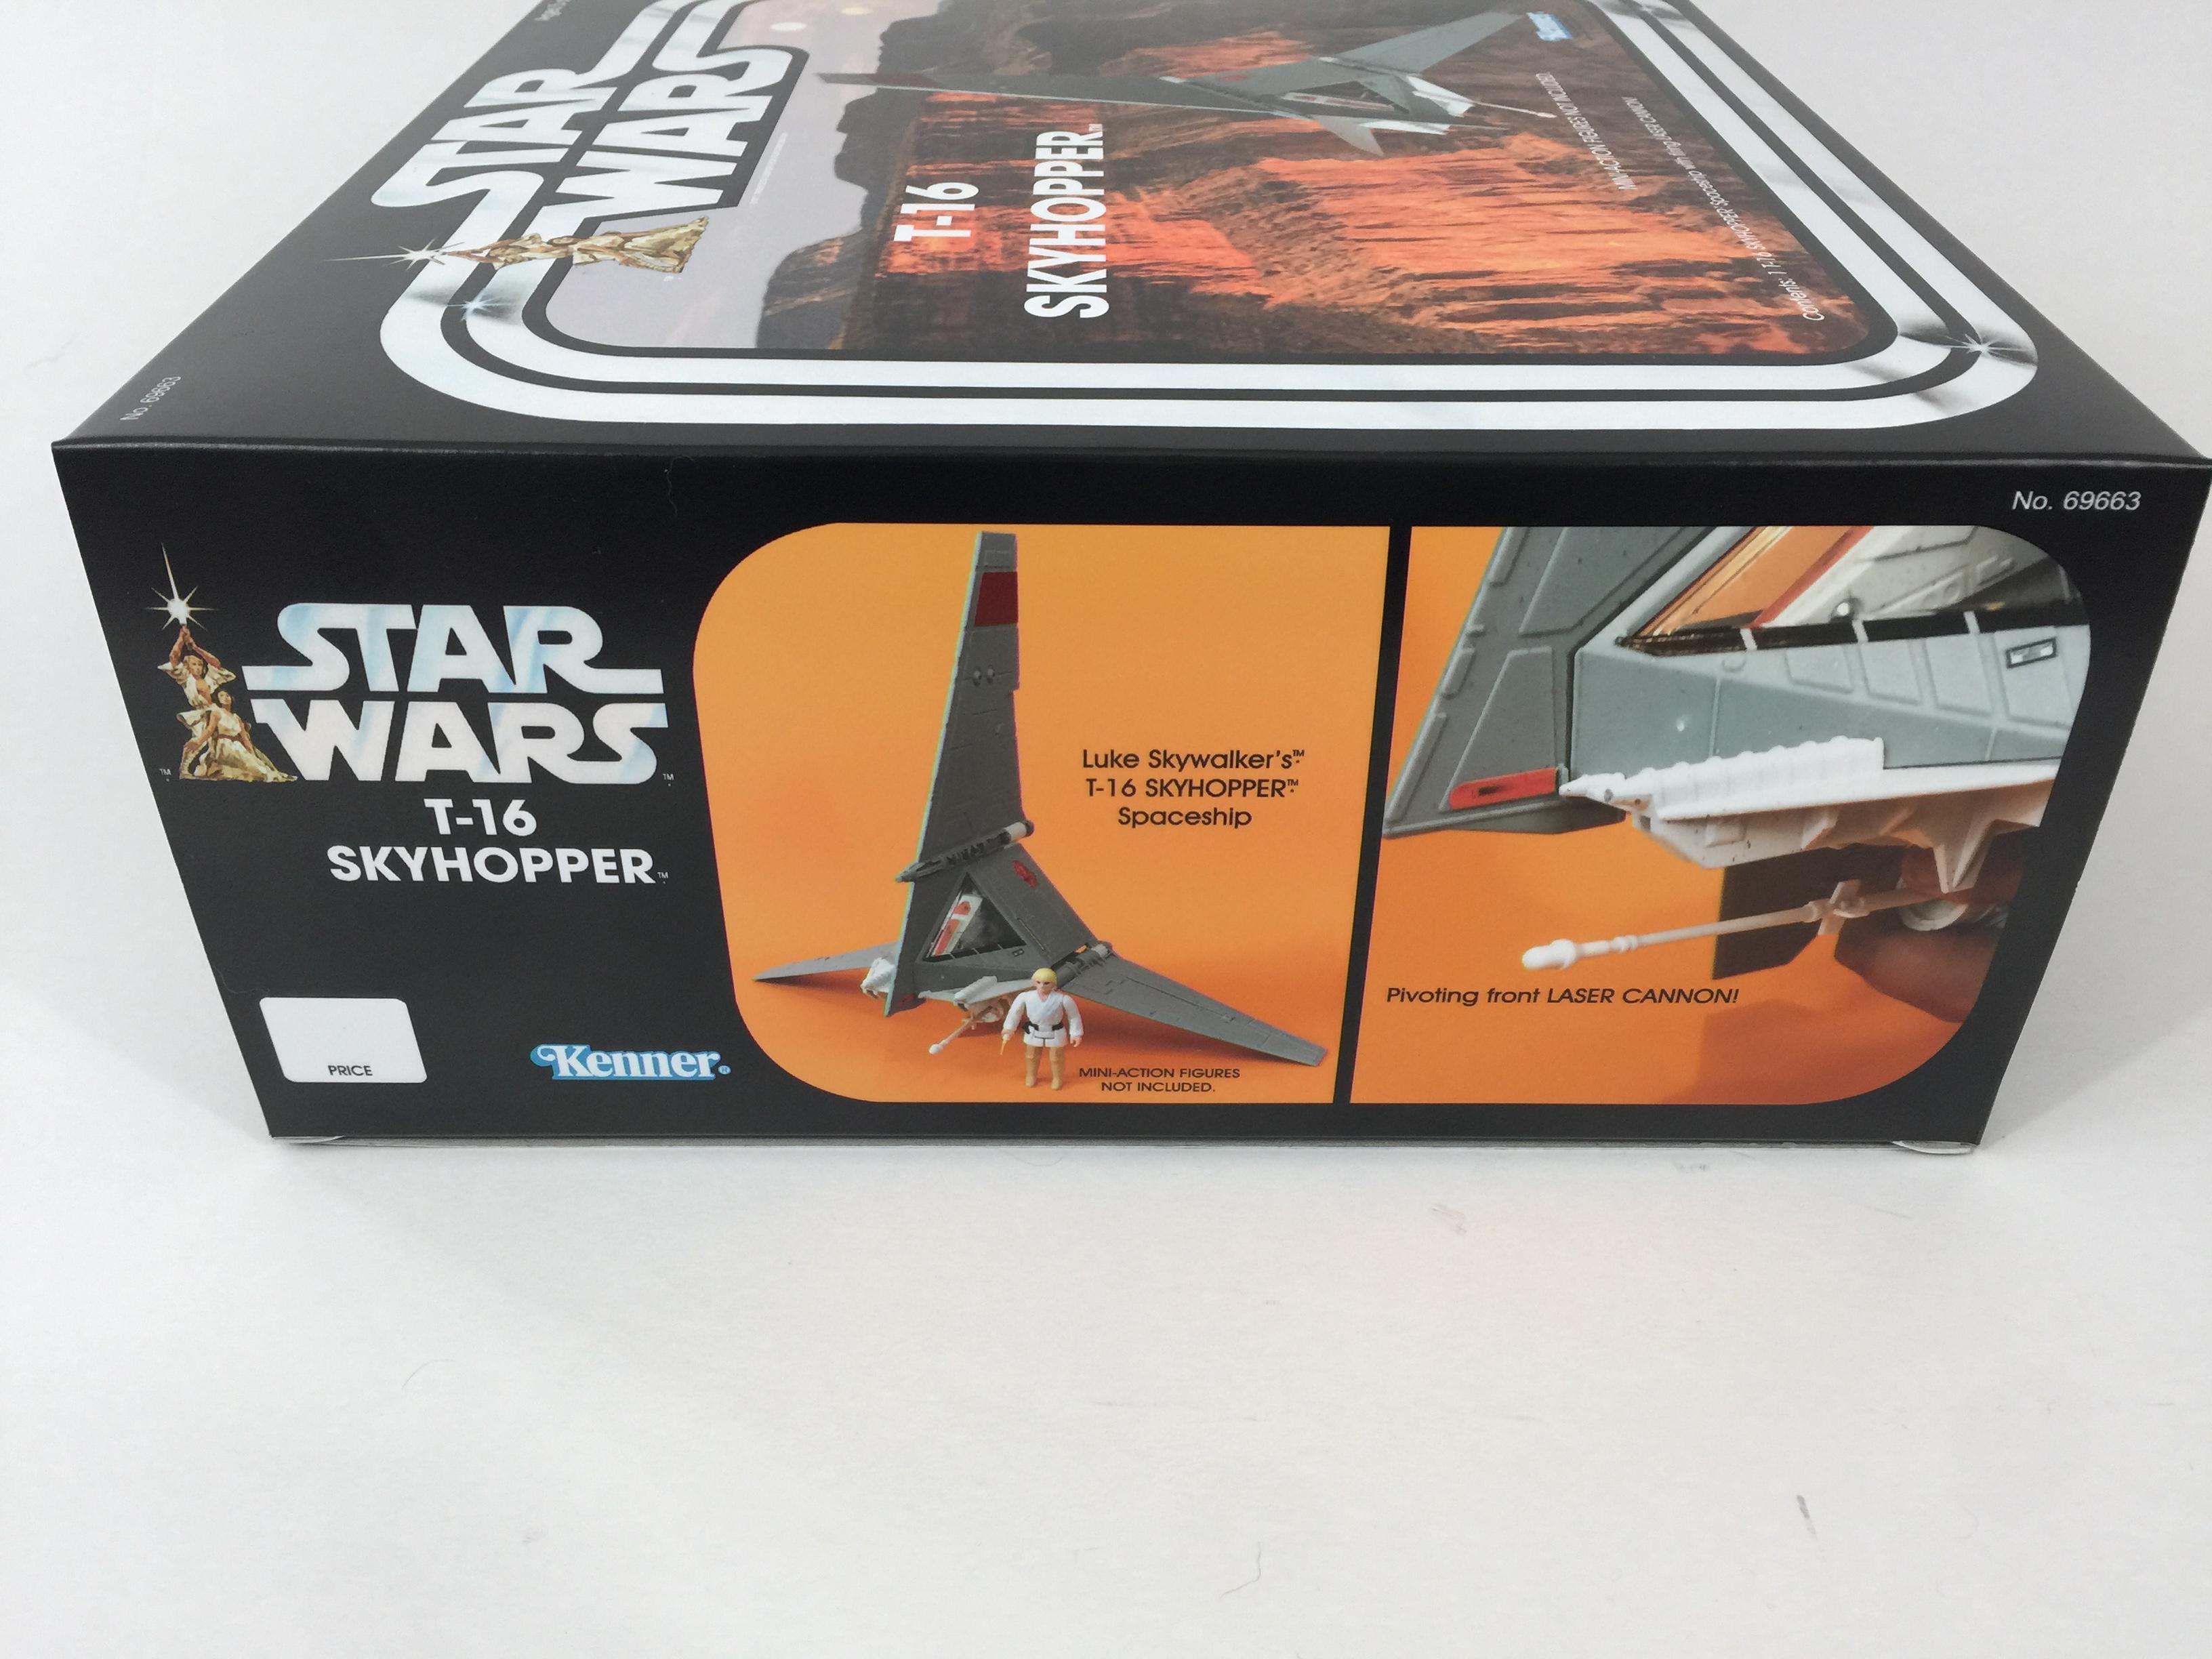 Custom Vintage Star Wars T-16 Skyhopper box and inserts